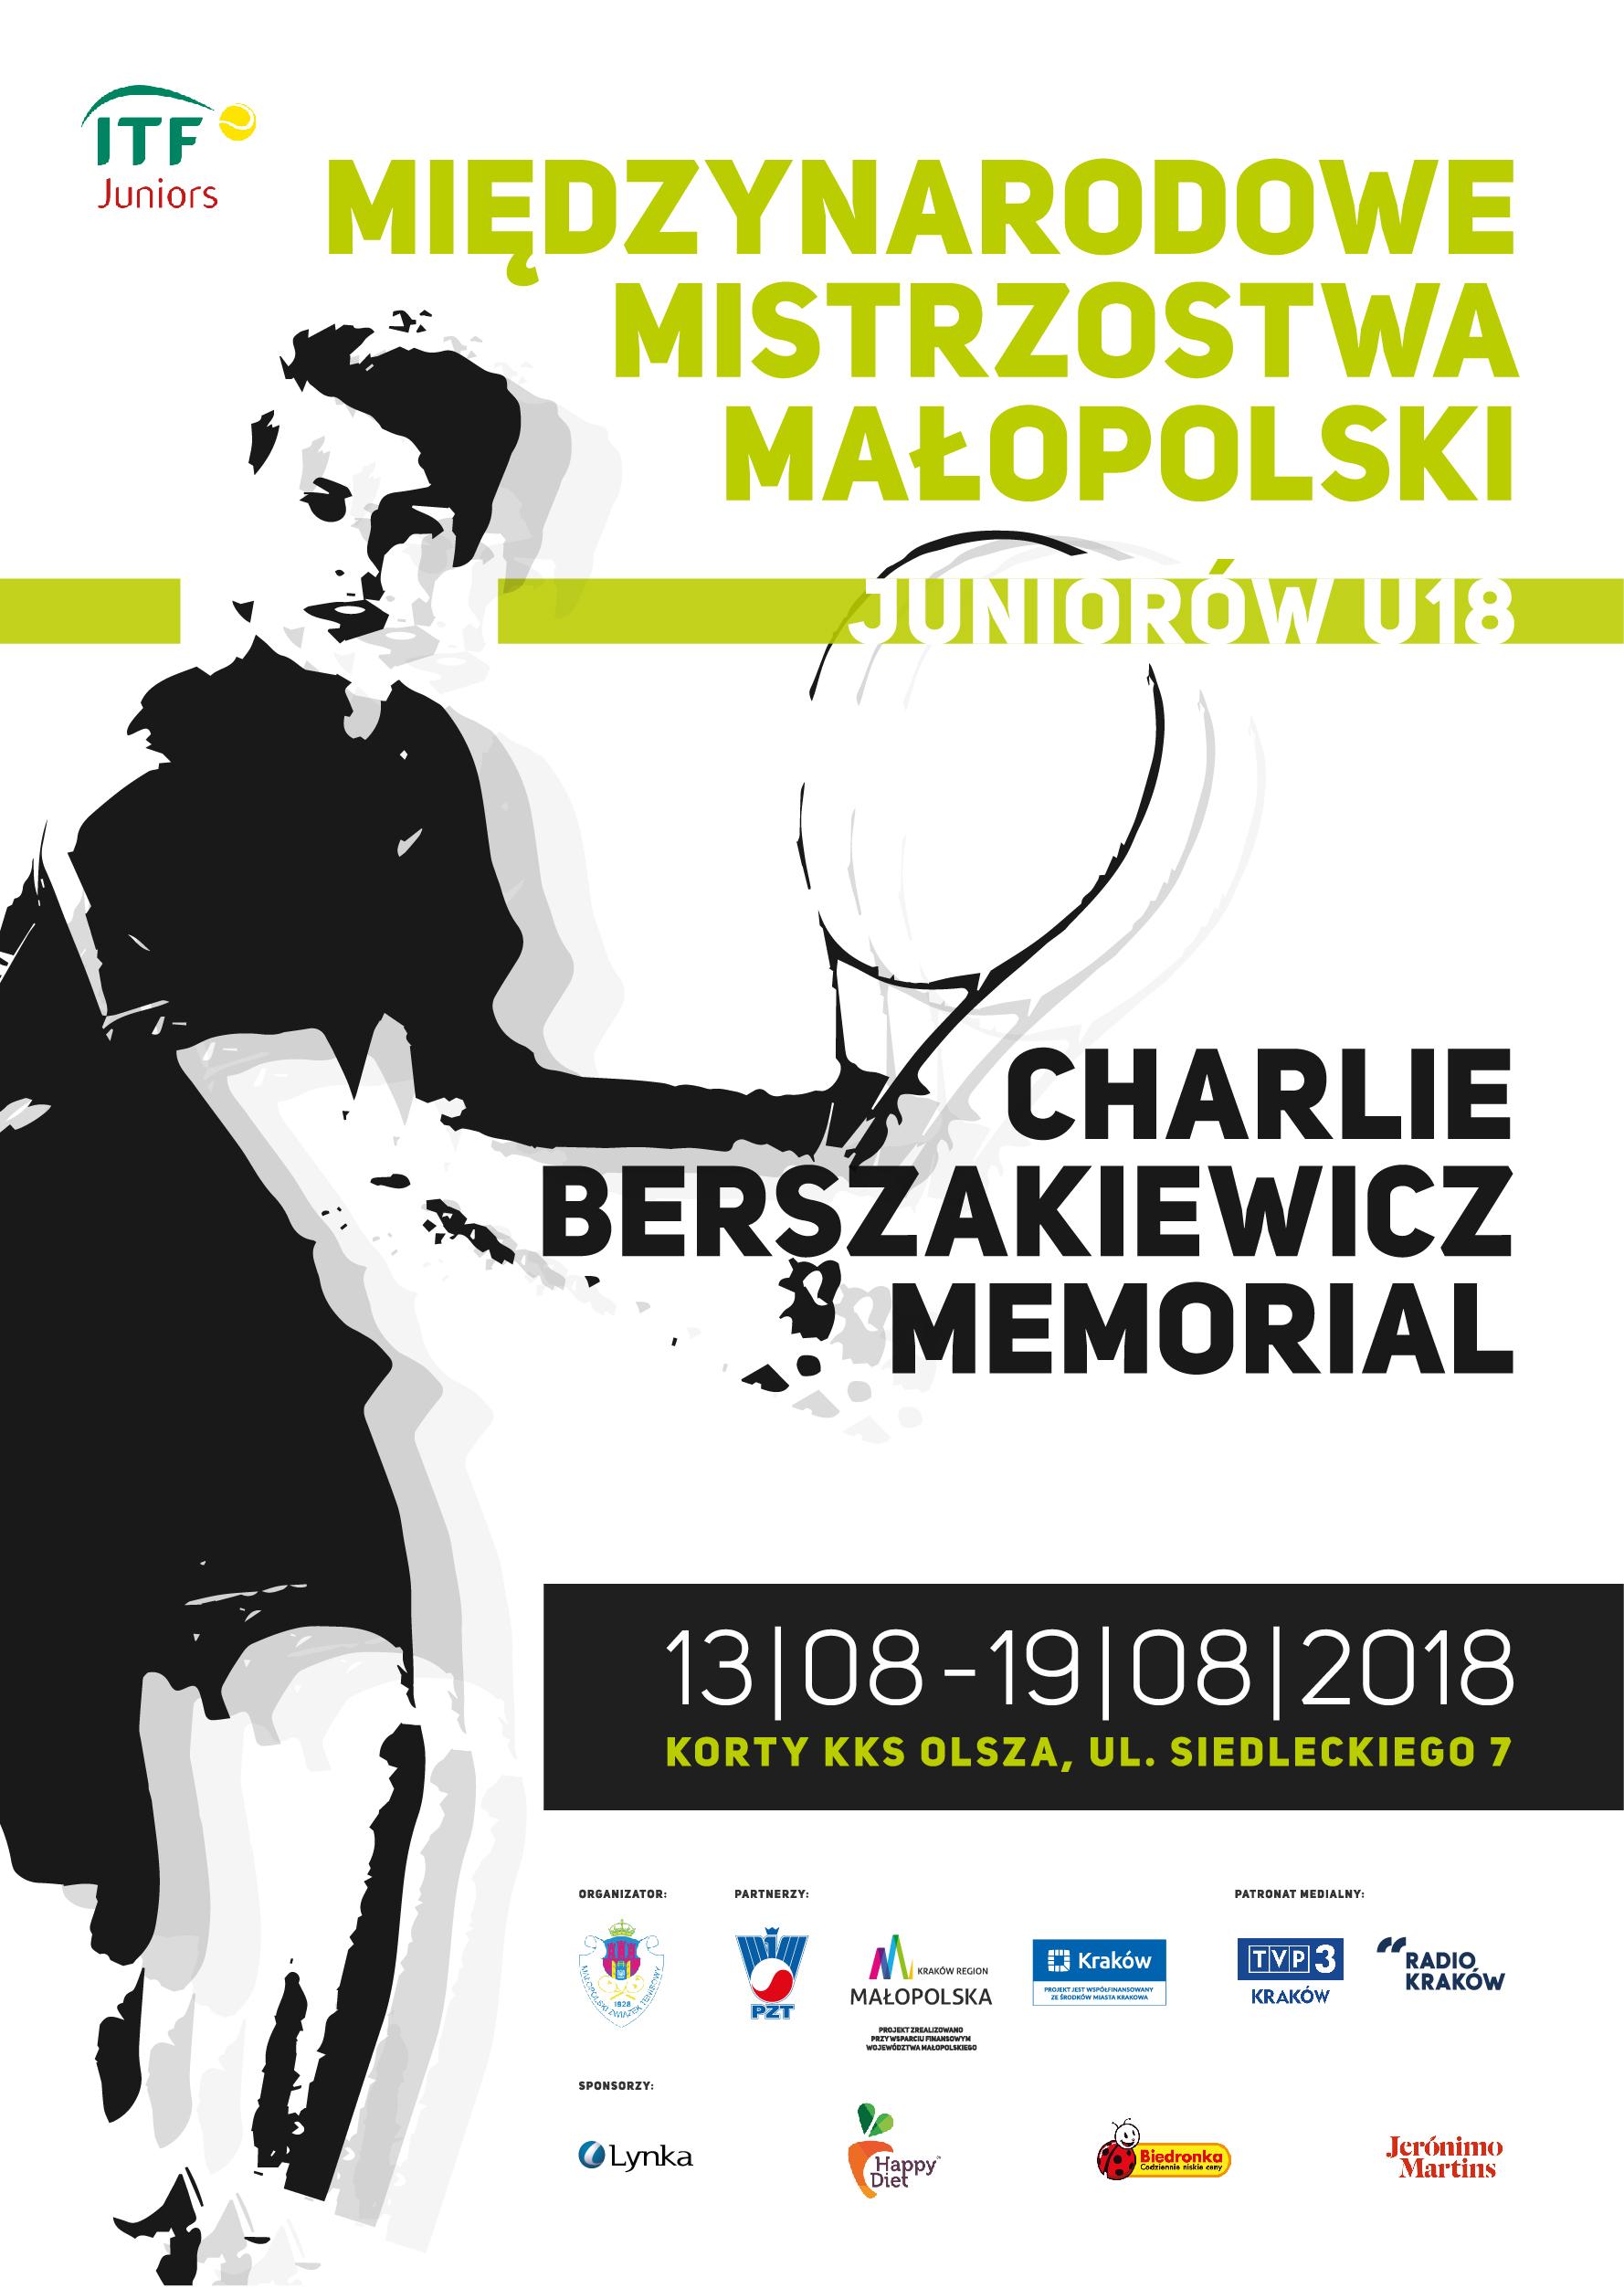 Plakat 2018 ITF Memoriał PL-01 (1)